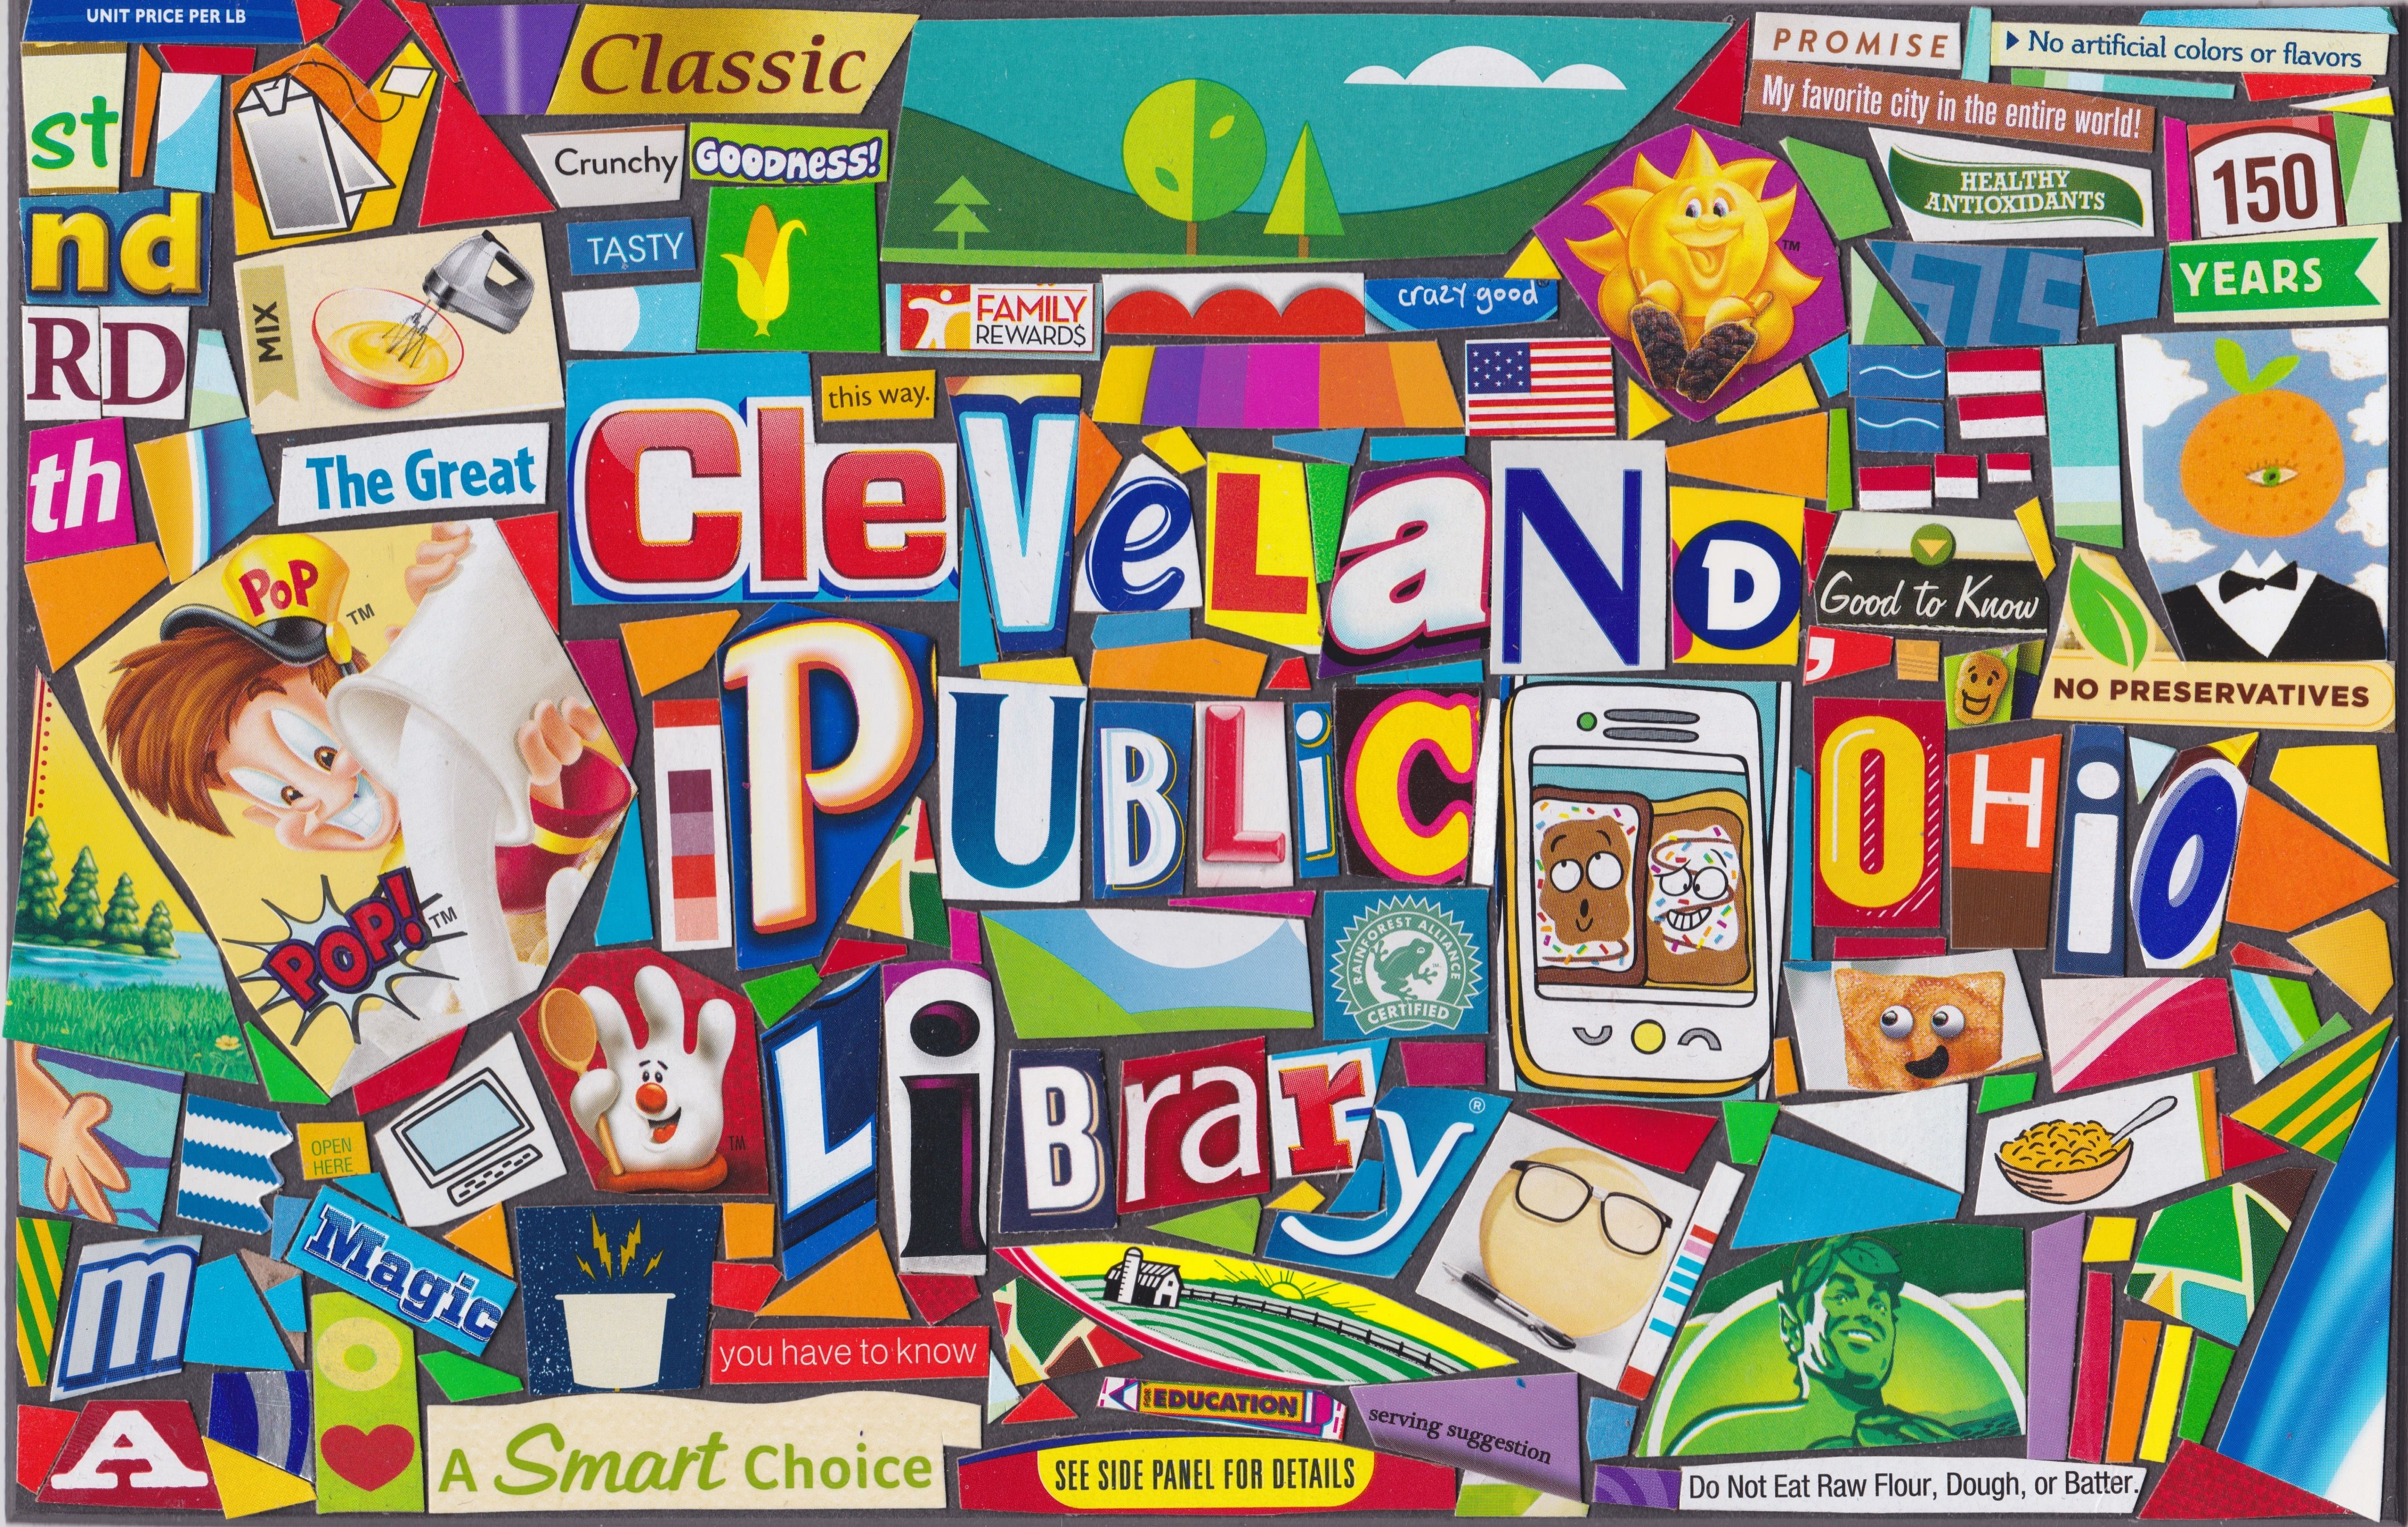 Cleveland Public Library November 2018 Modern pop art